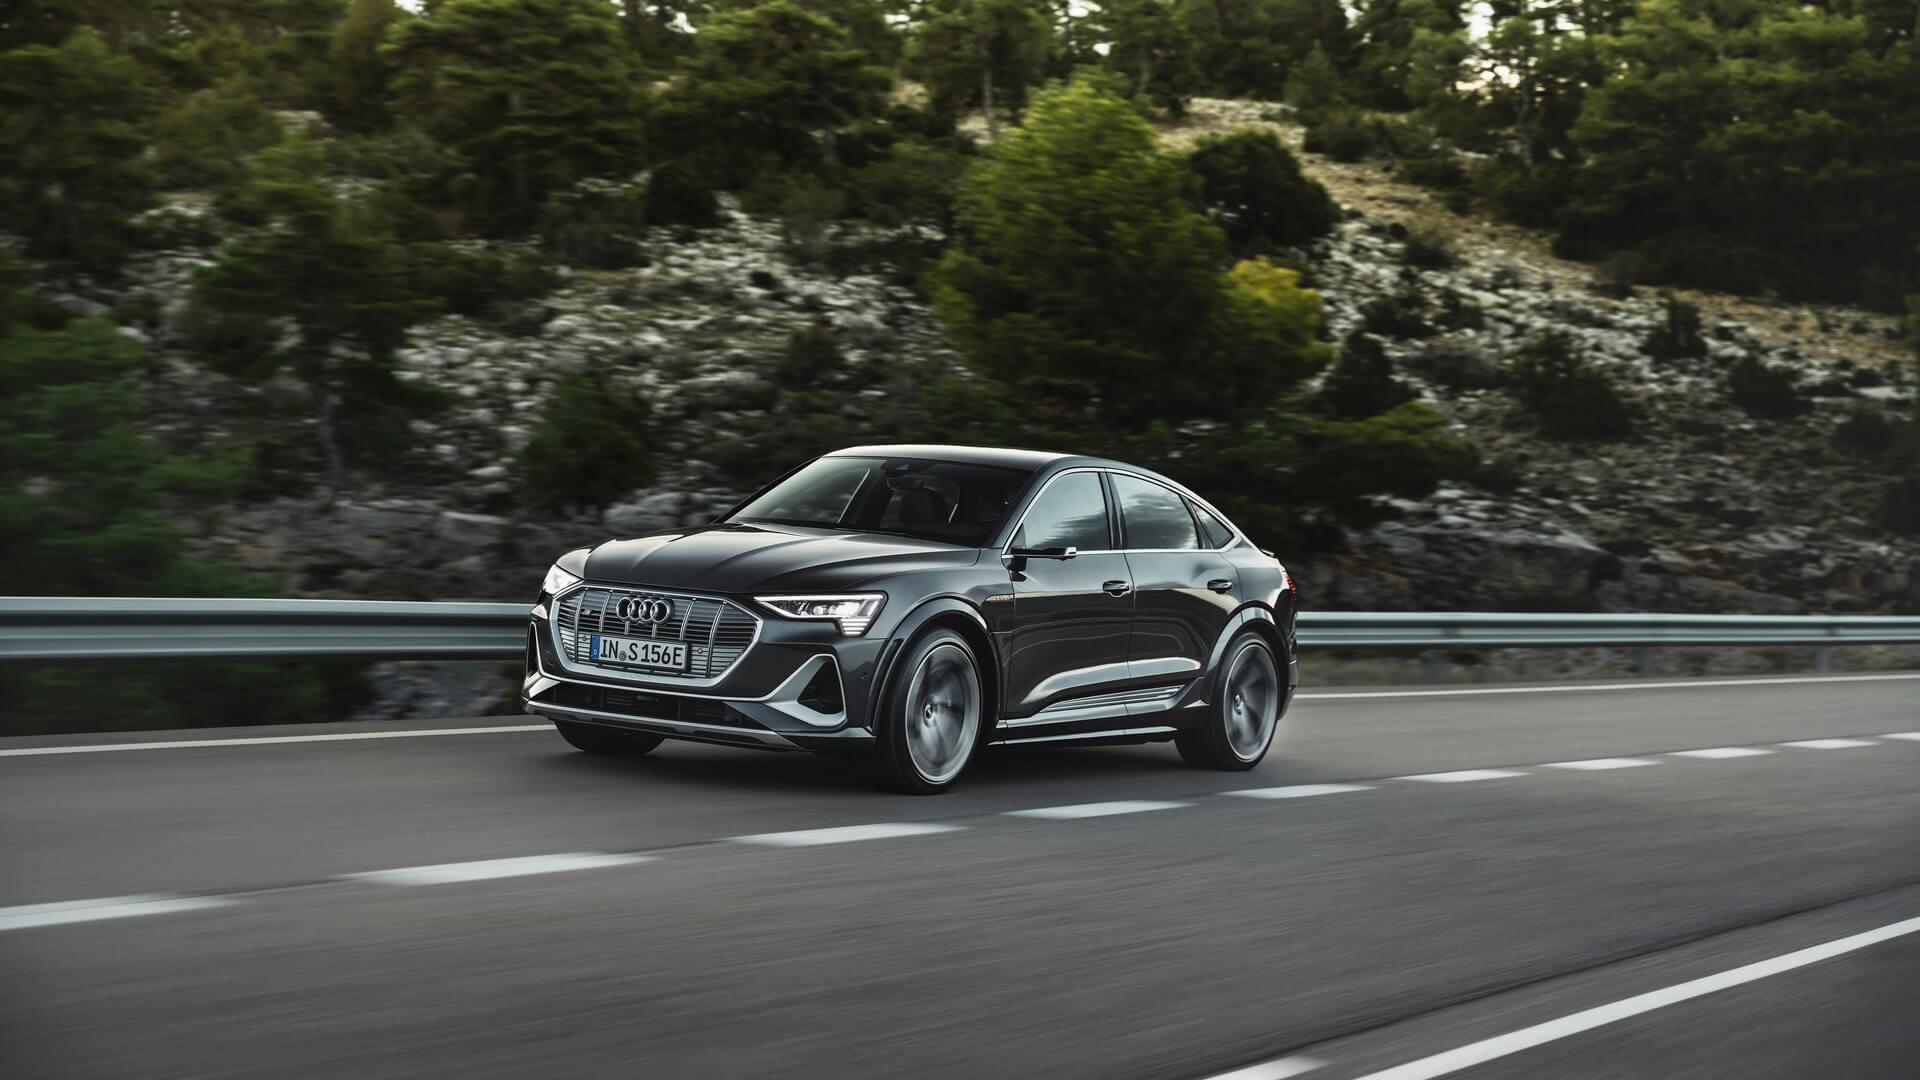 Audi-E-Tron-S-and-E-Tron-S-Sportback-2020-41